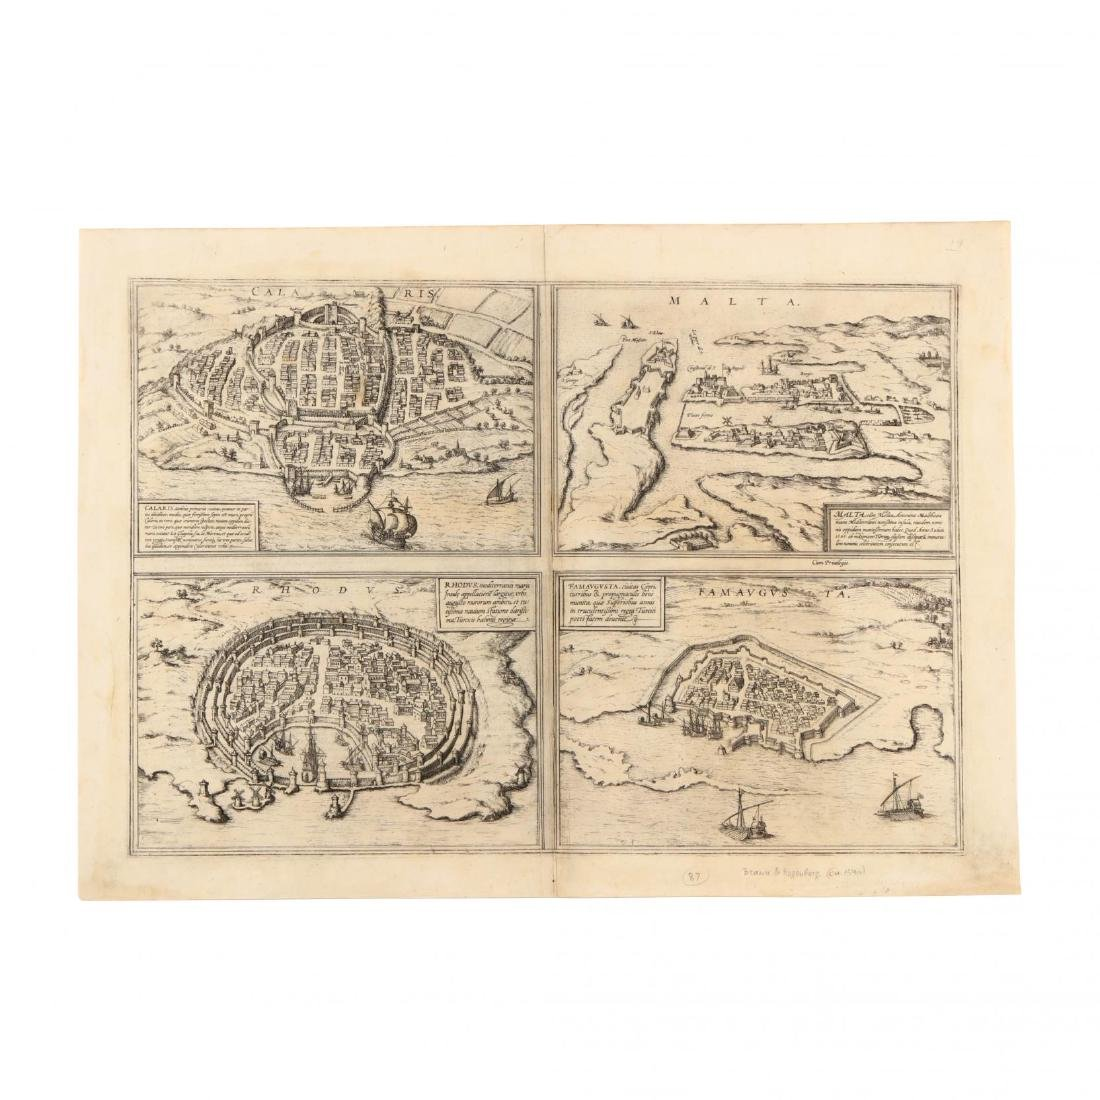 Hogenberg, F. and Braun G., Plate from  Civitates Orbis